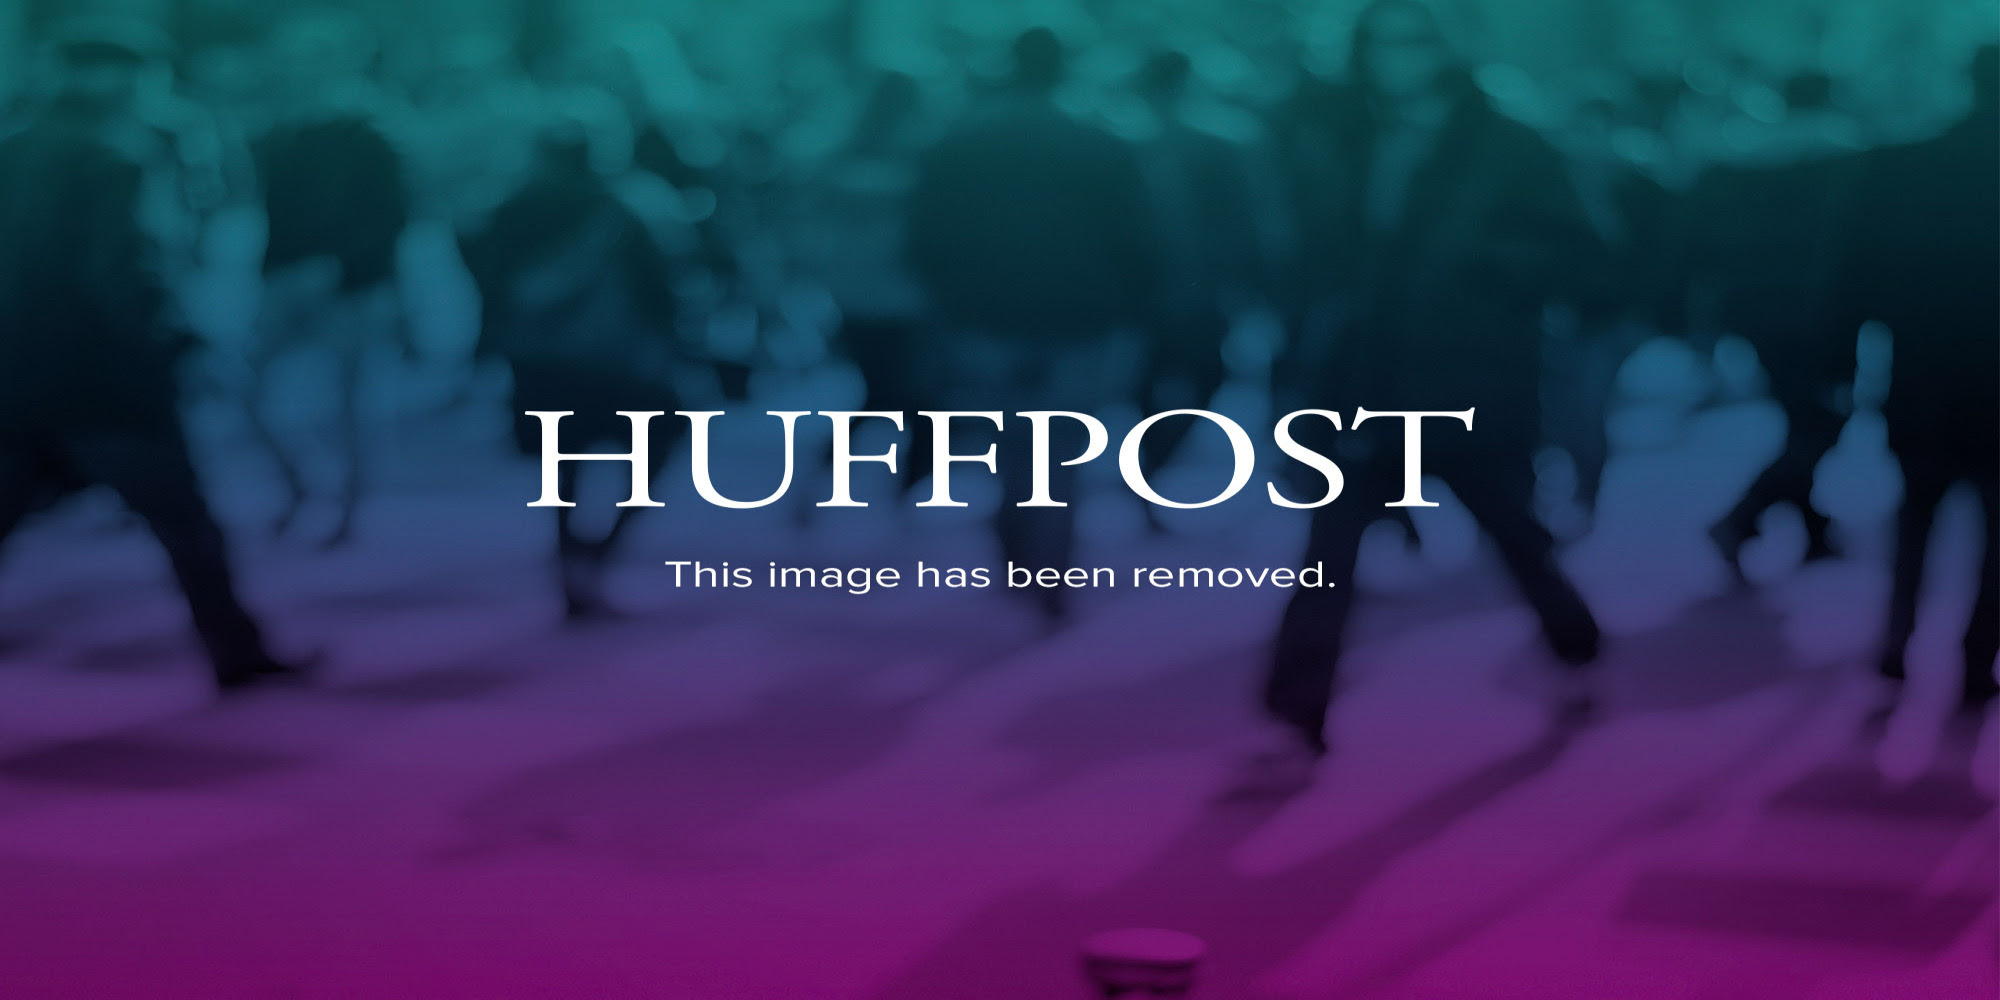 http://i.huffpost.com/gen/963637/thumbs/o-HURRICANE-KATRINA-DESTRUCTION-facebook.jpg